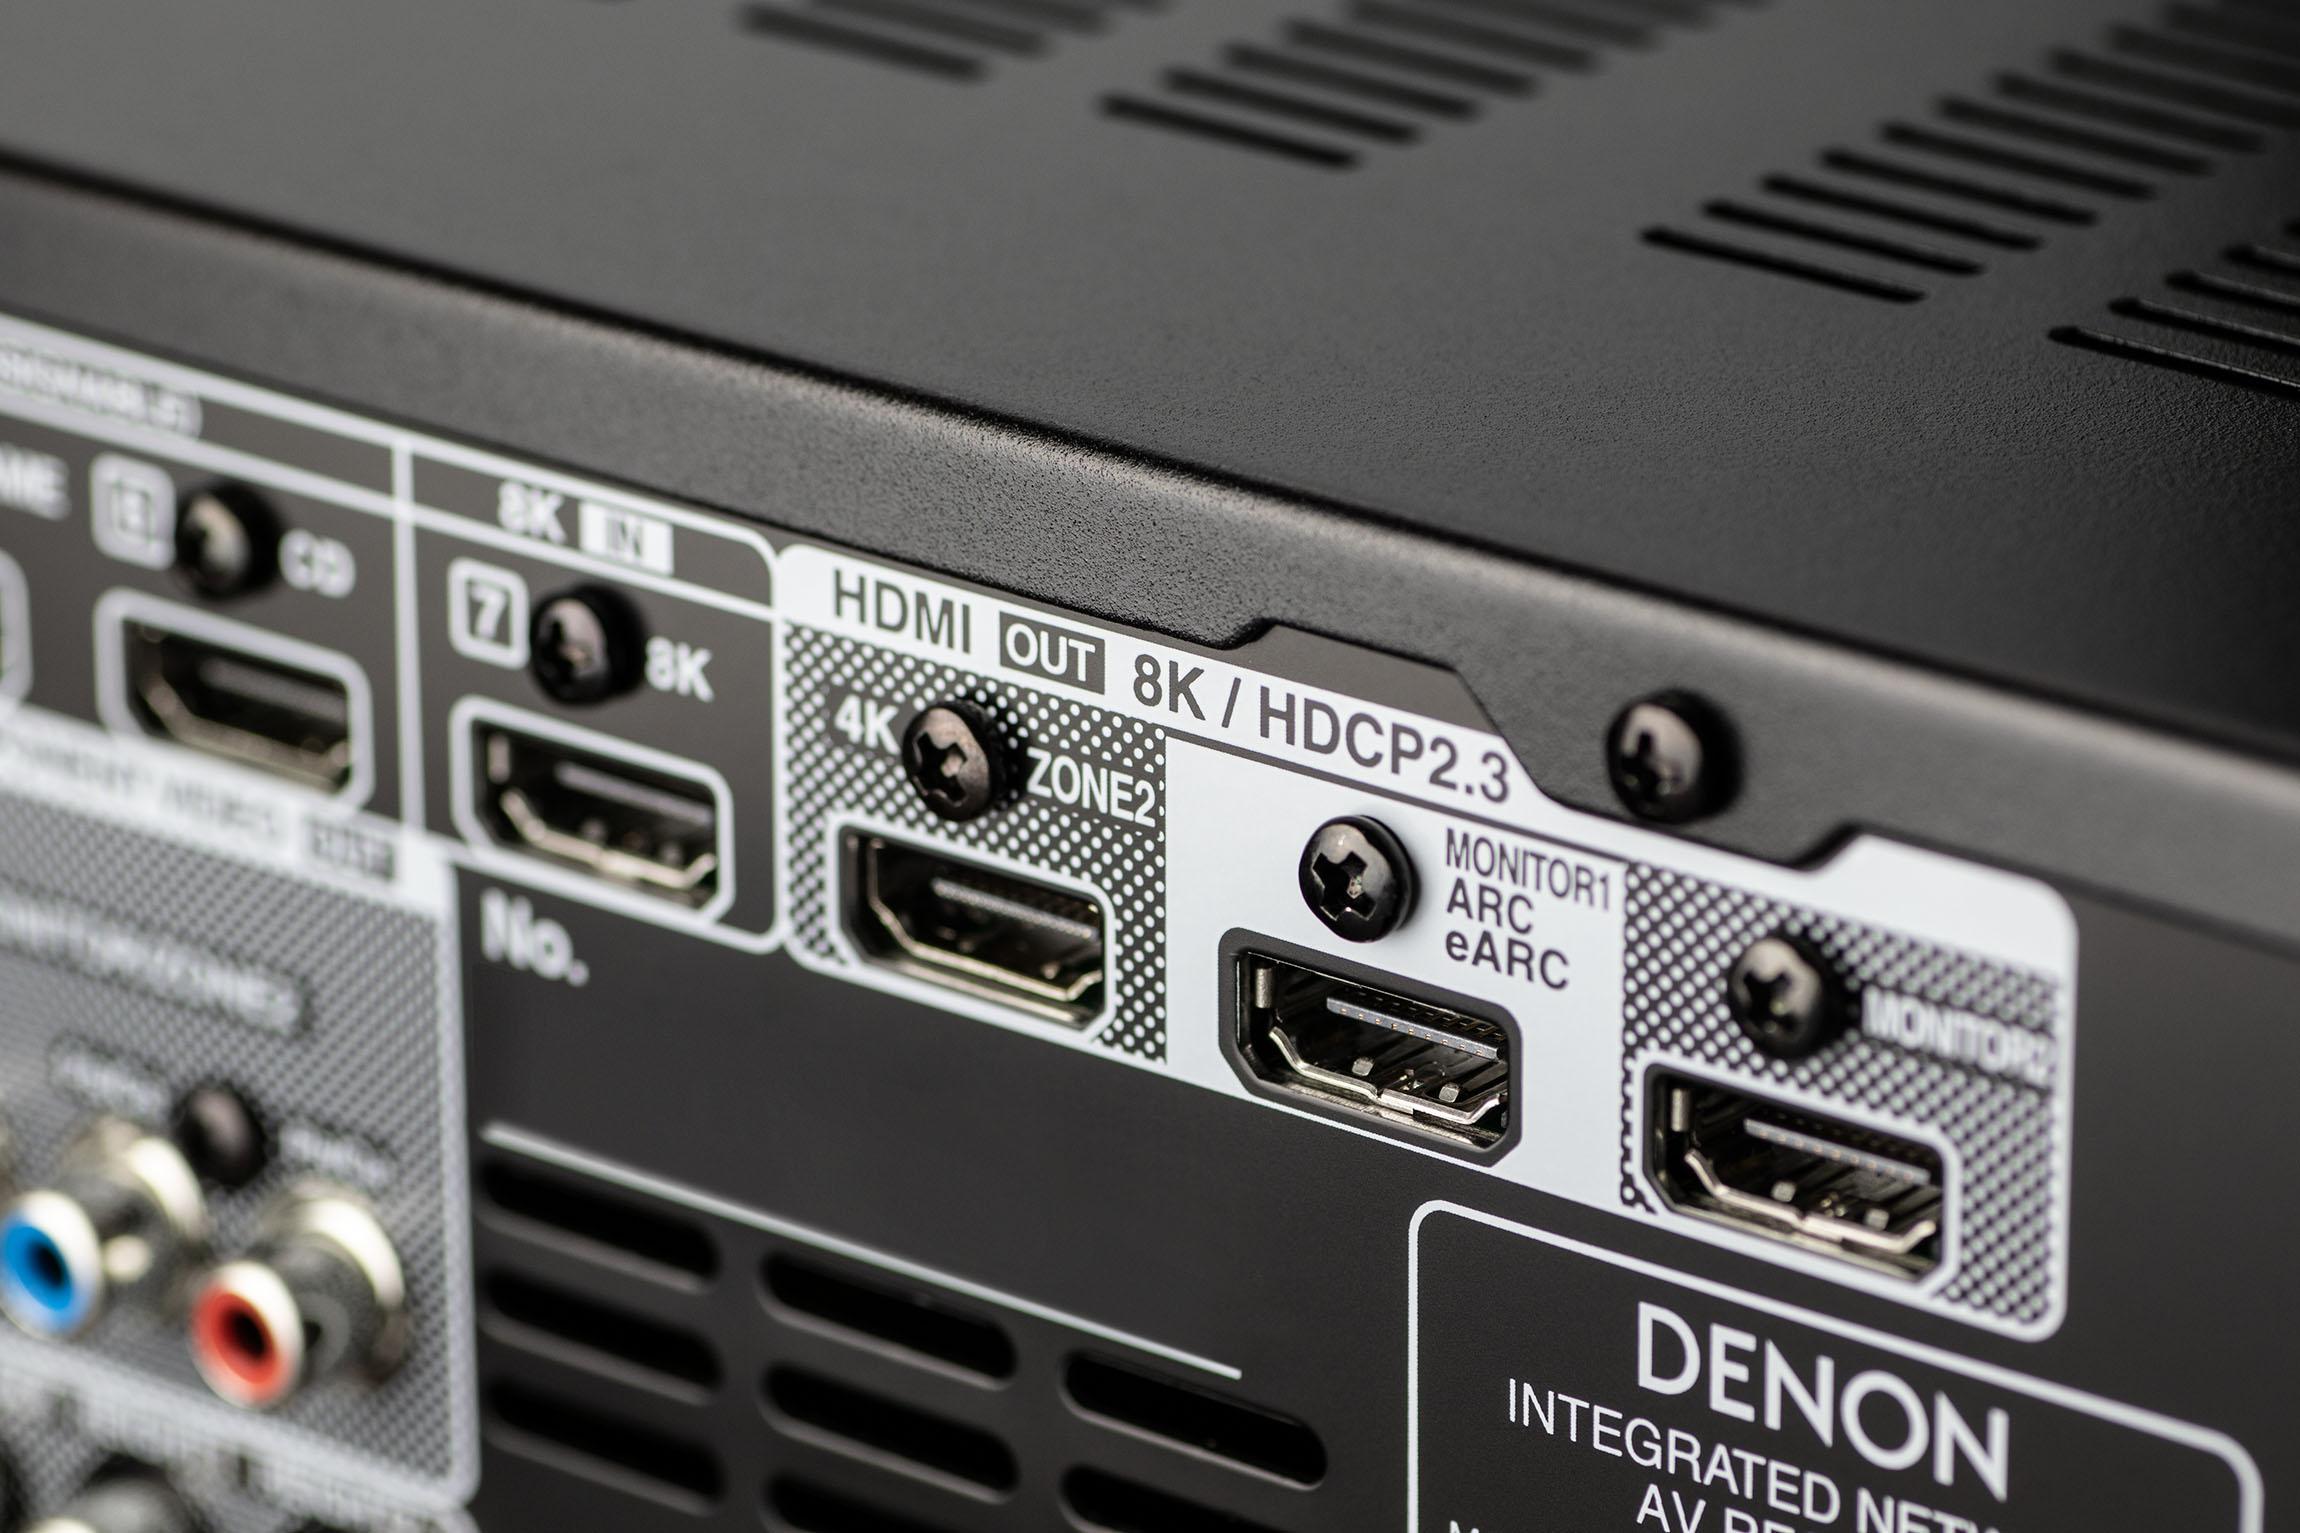 32_AVC-X4700H_8K_HDMI_out